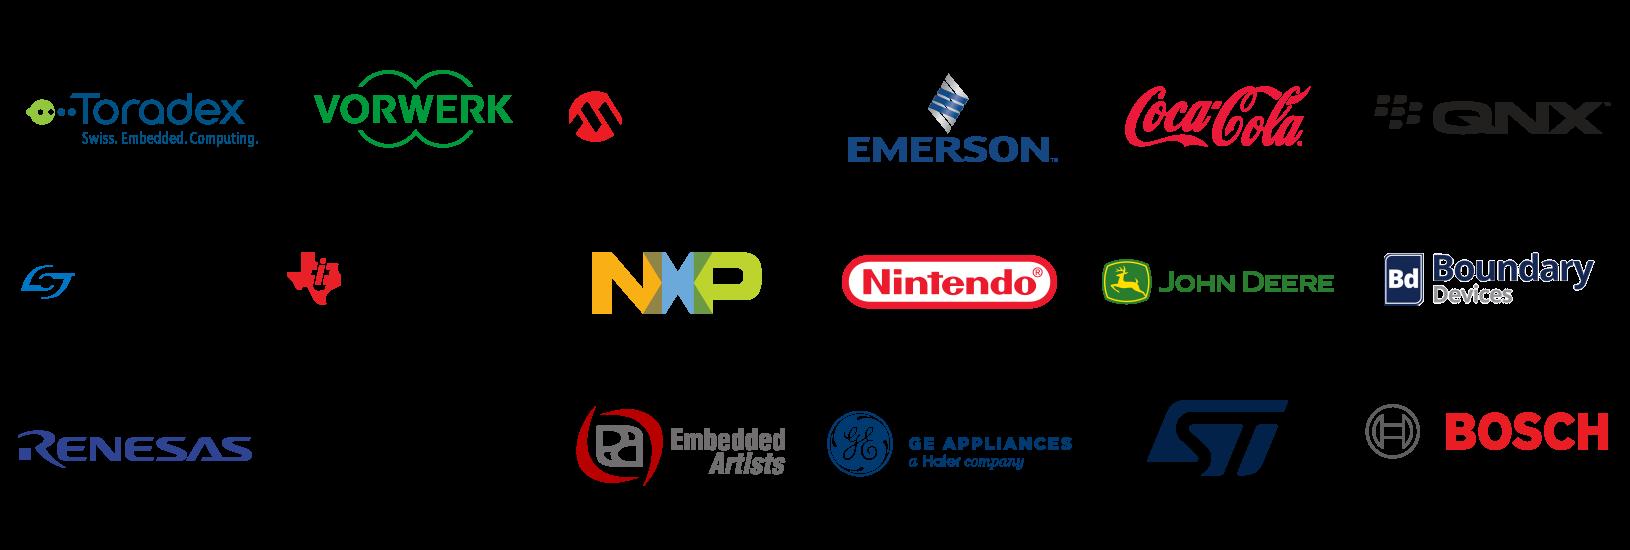 hardware-crank-customers